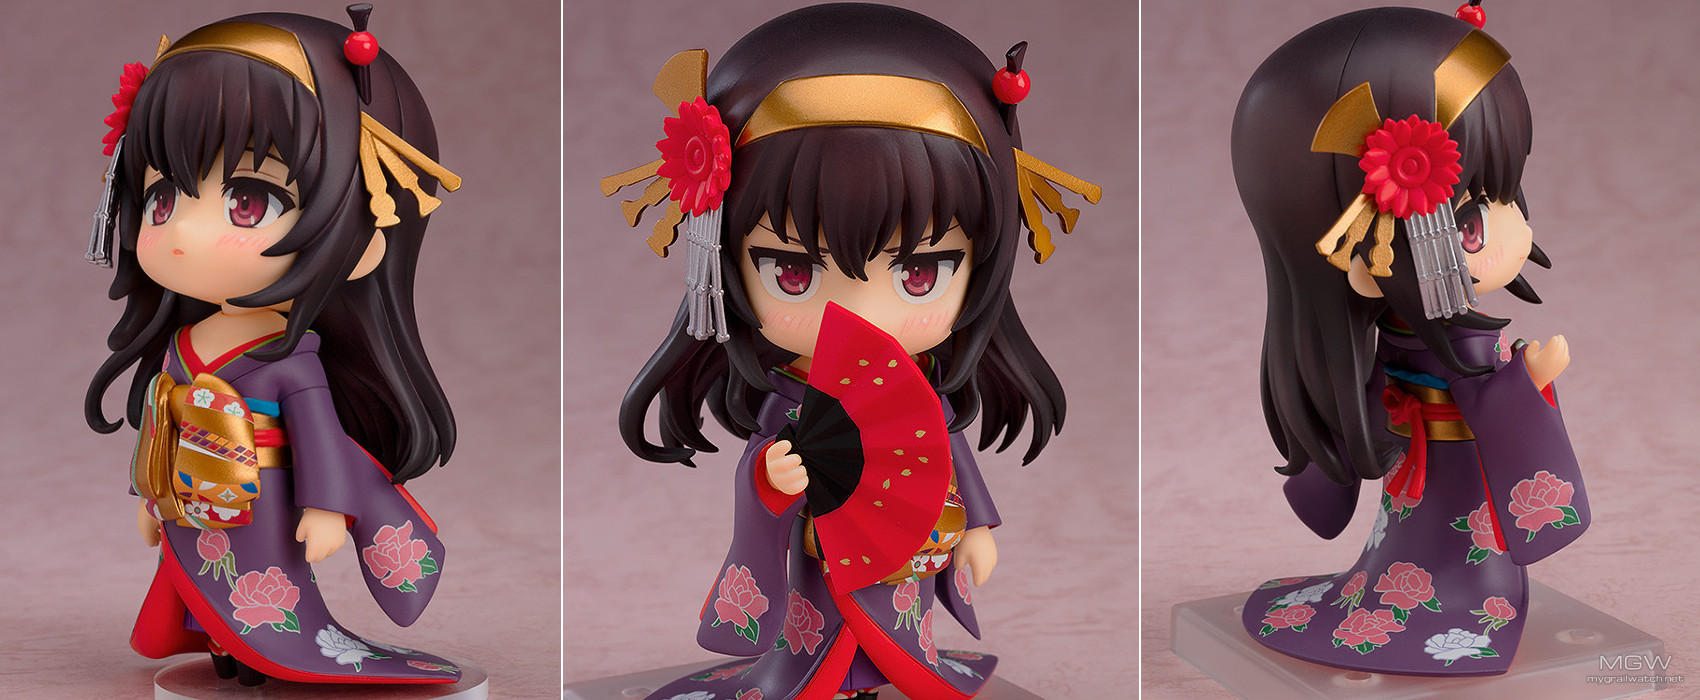 Nendoroid Utaha Kasumigaoka Kimono Ver. from Saekano Fine